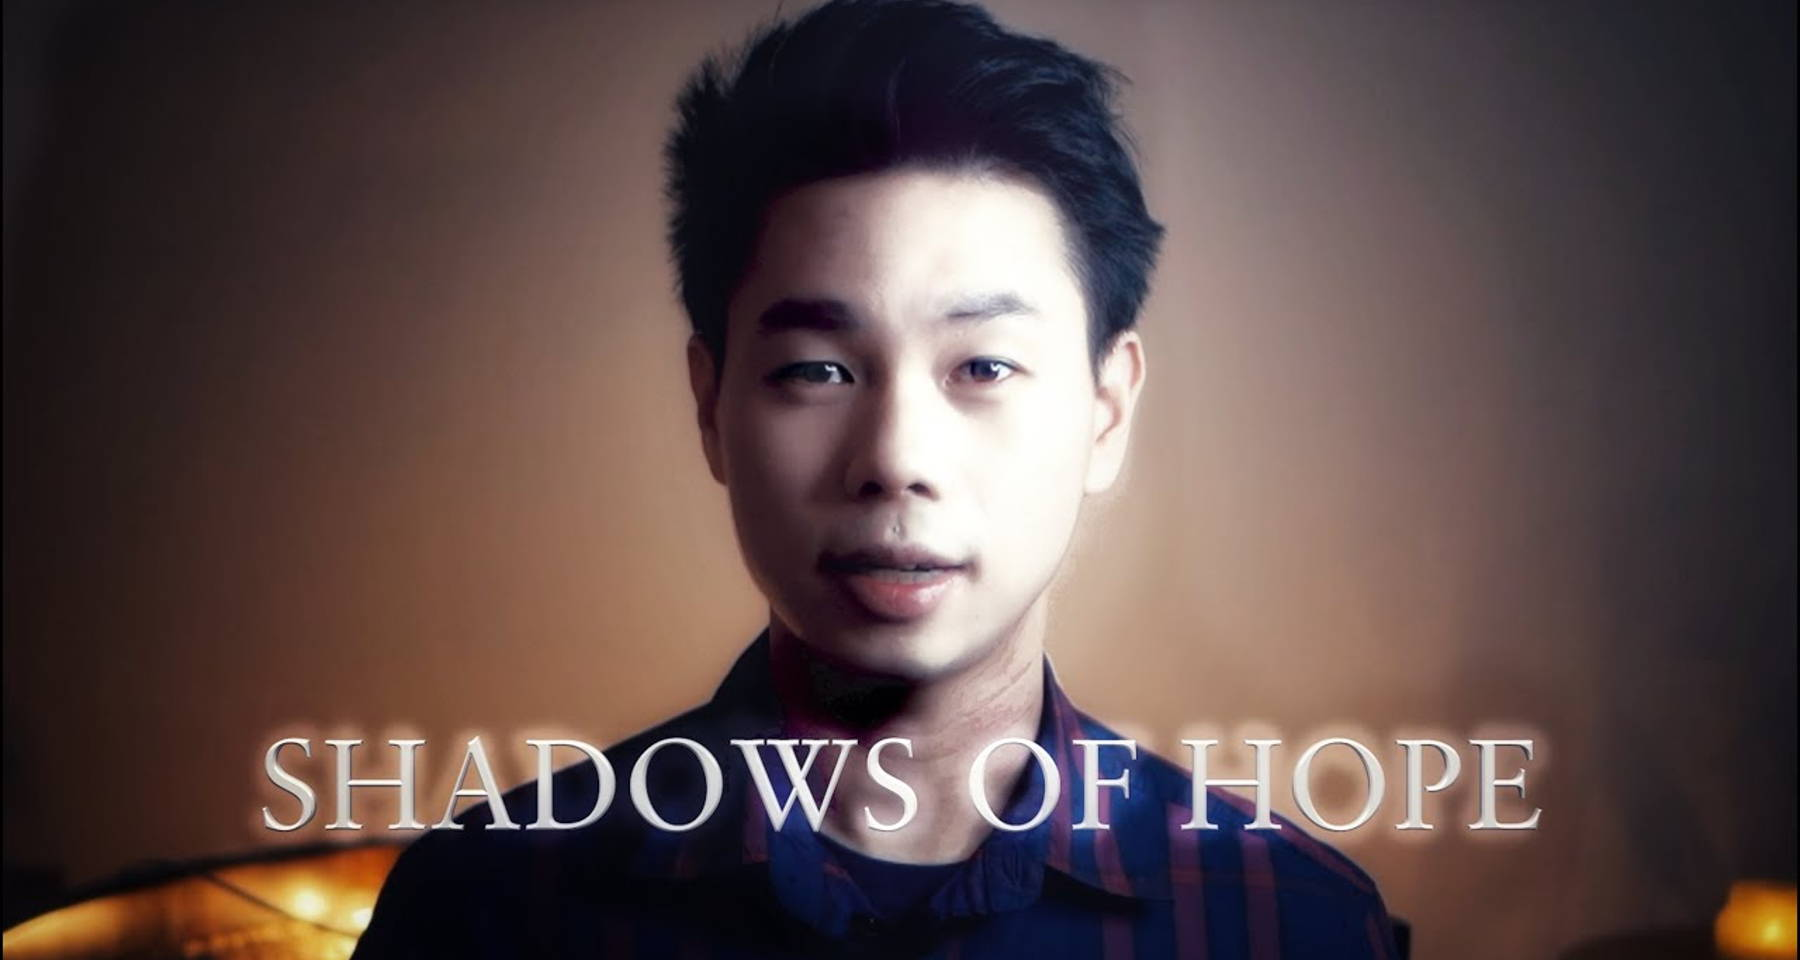 Shadows of Hope (Violin Music)